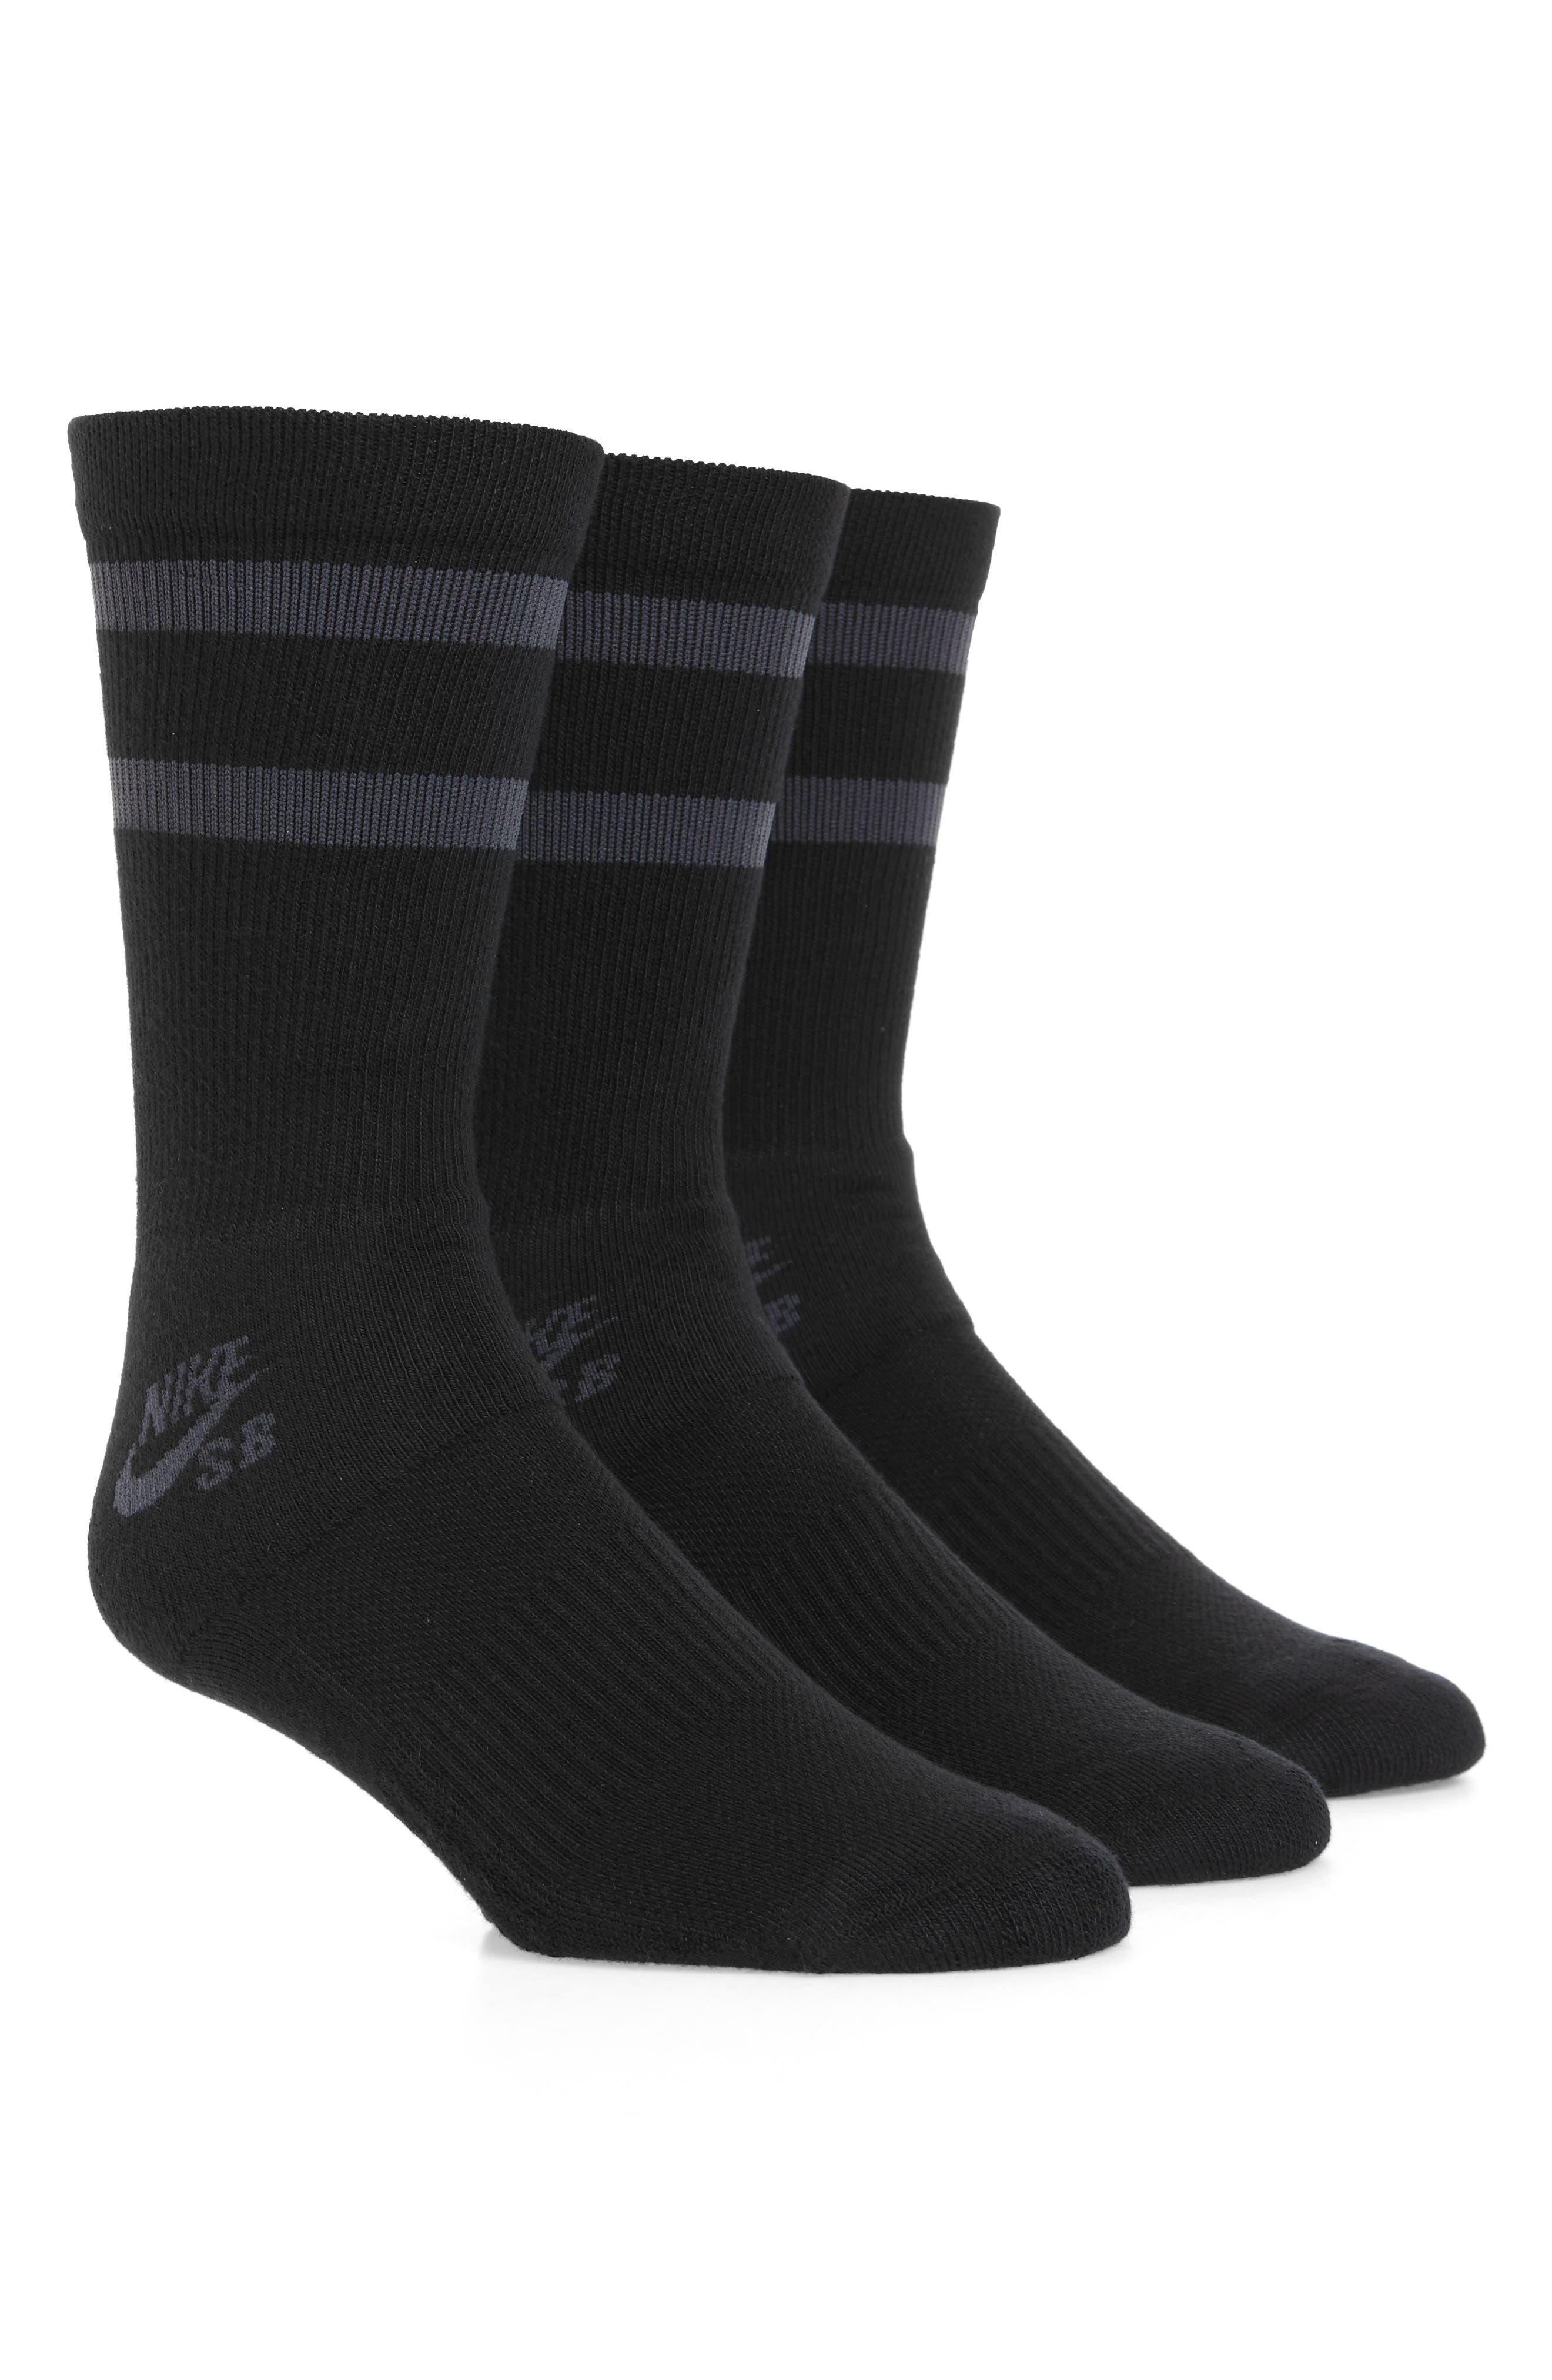 SB 3-Pack Crew Socks,                             Main thumbnail 1, color,                             001